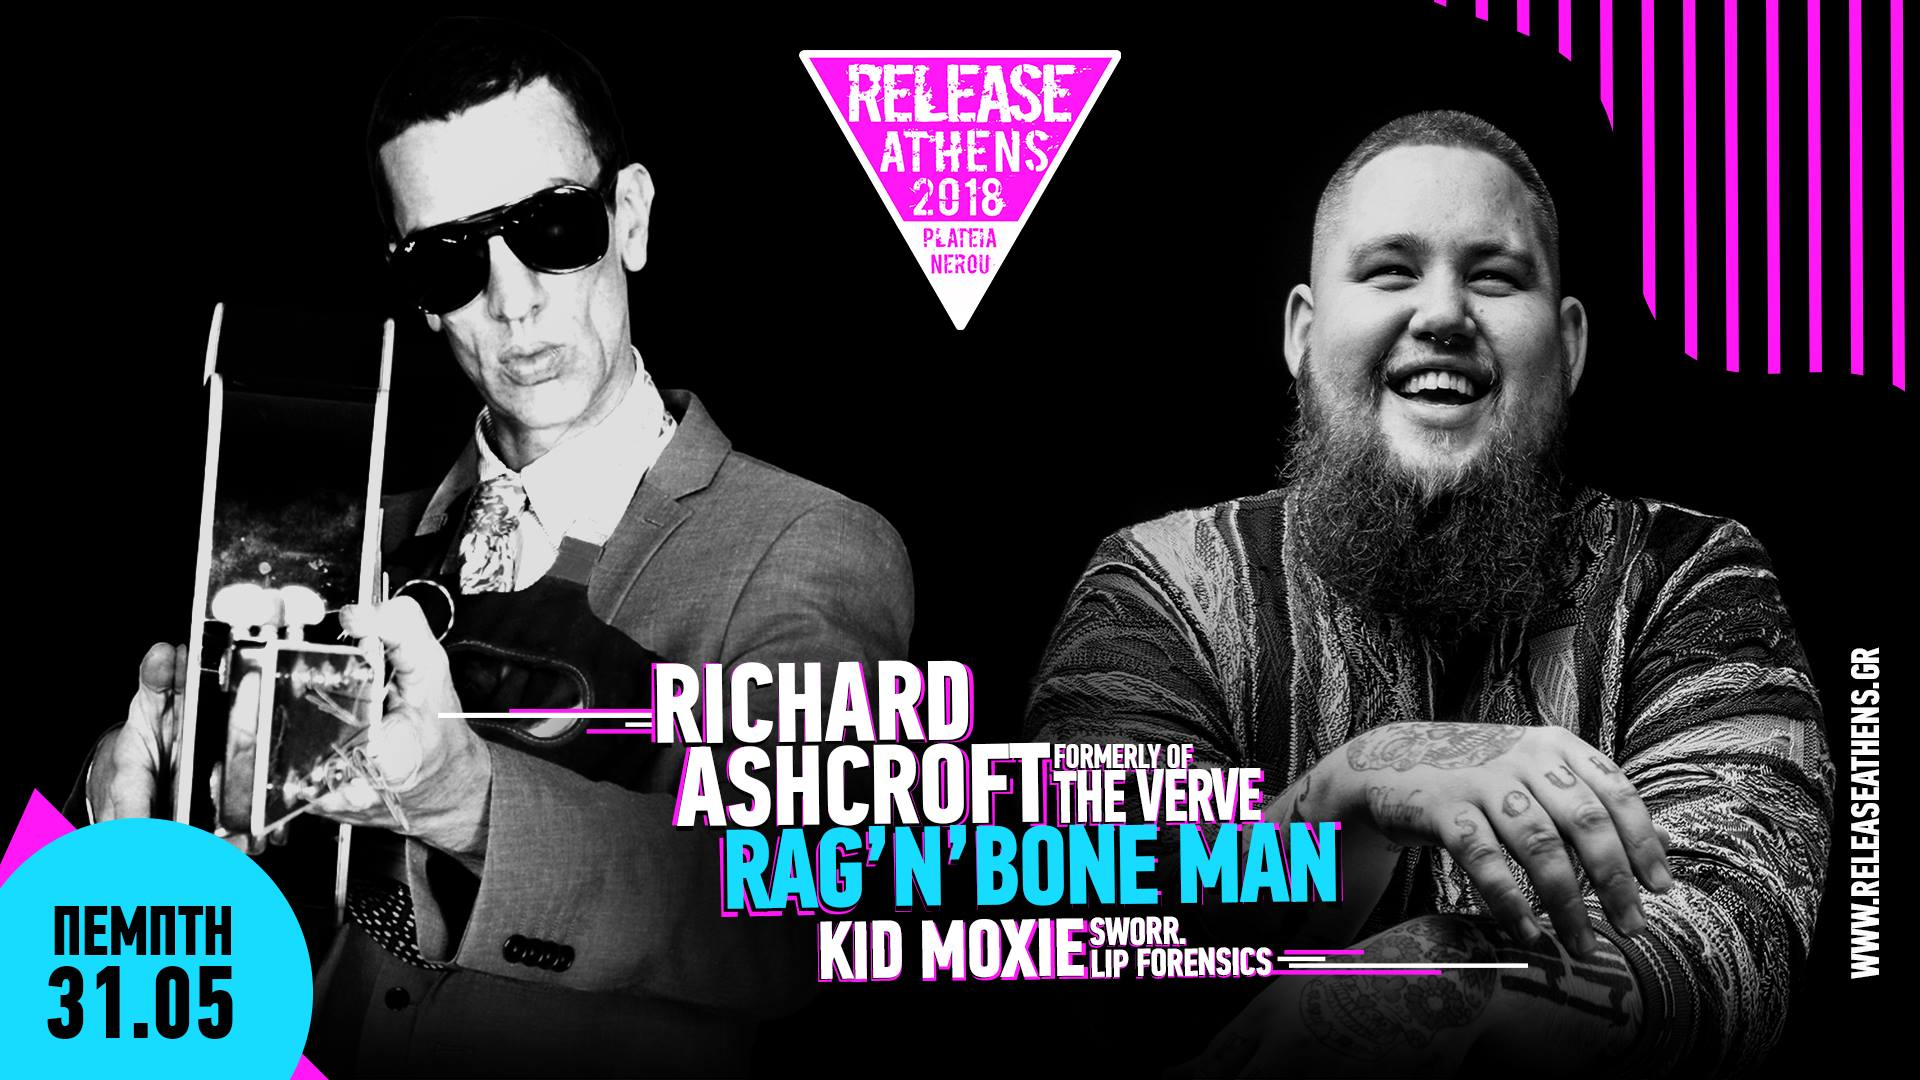 Release Athens Festival 2018 - Richard Ashcroft, Rag'n'Bone Man + more_header.jpg